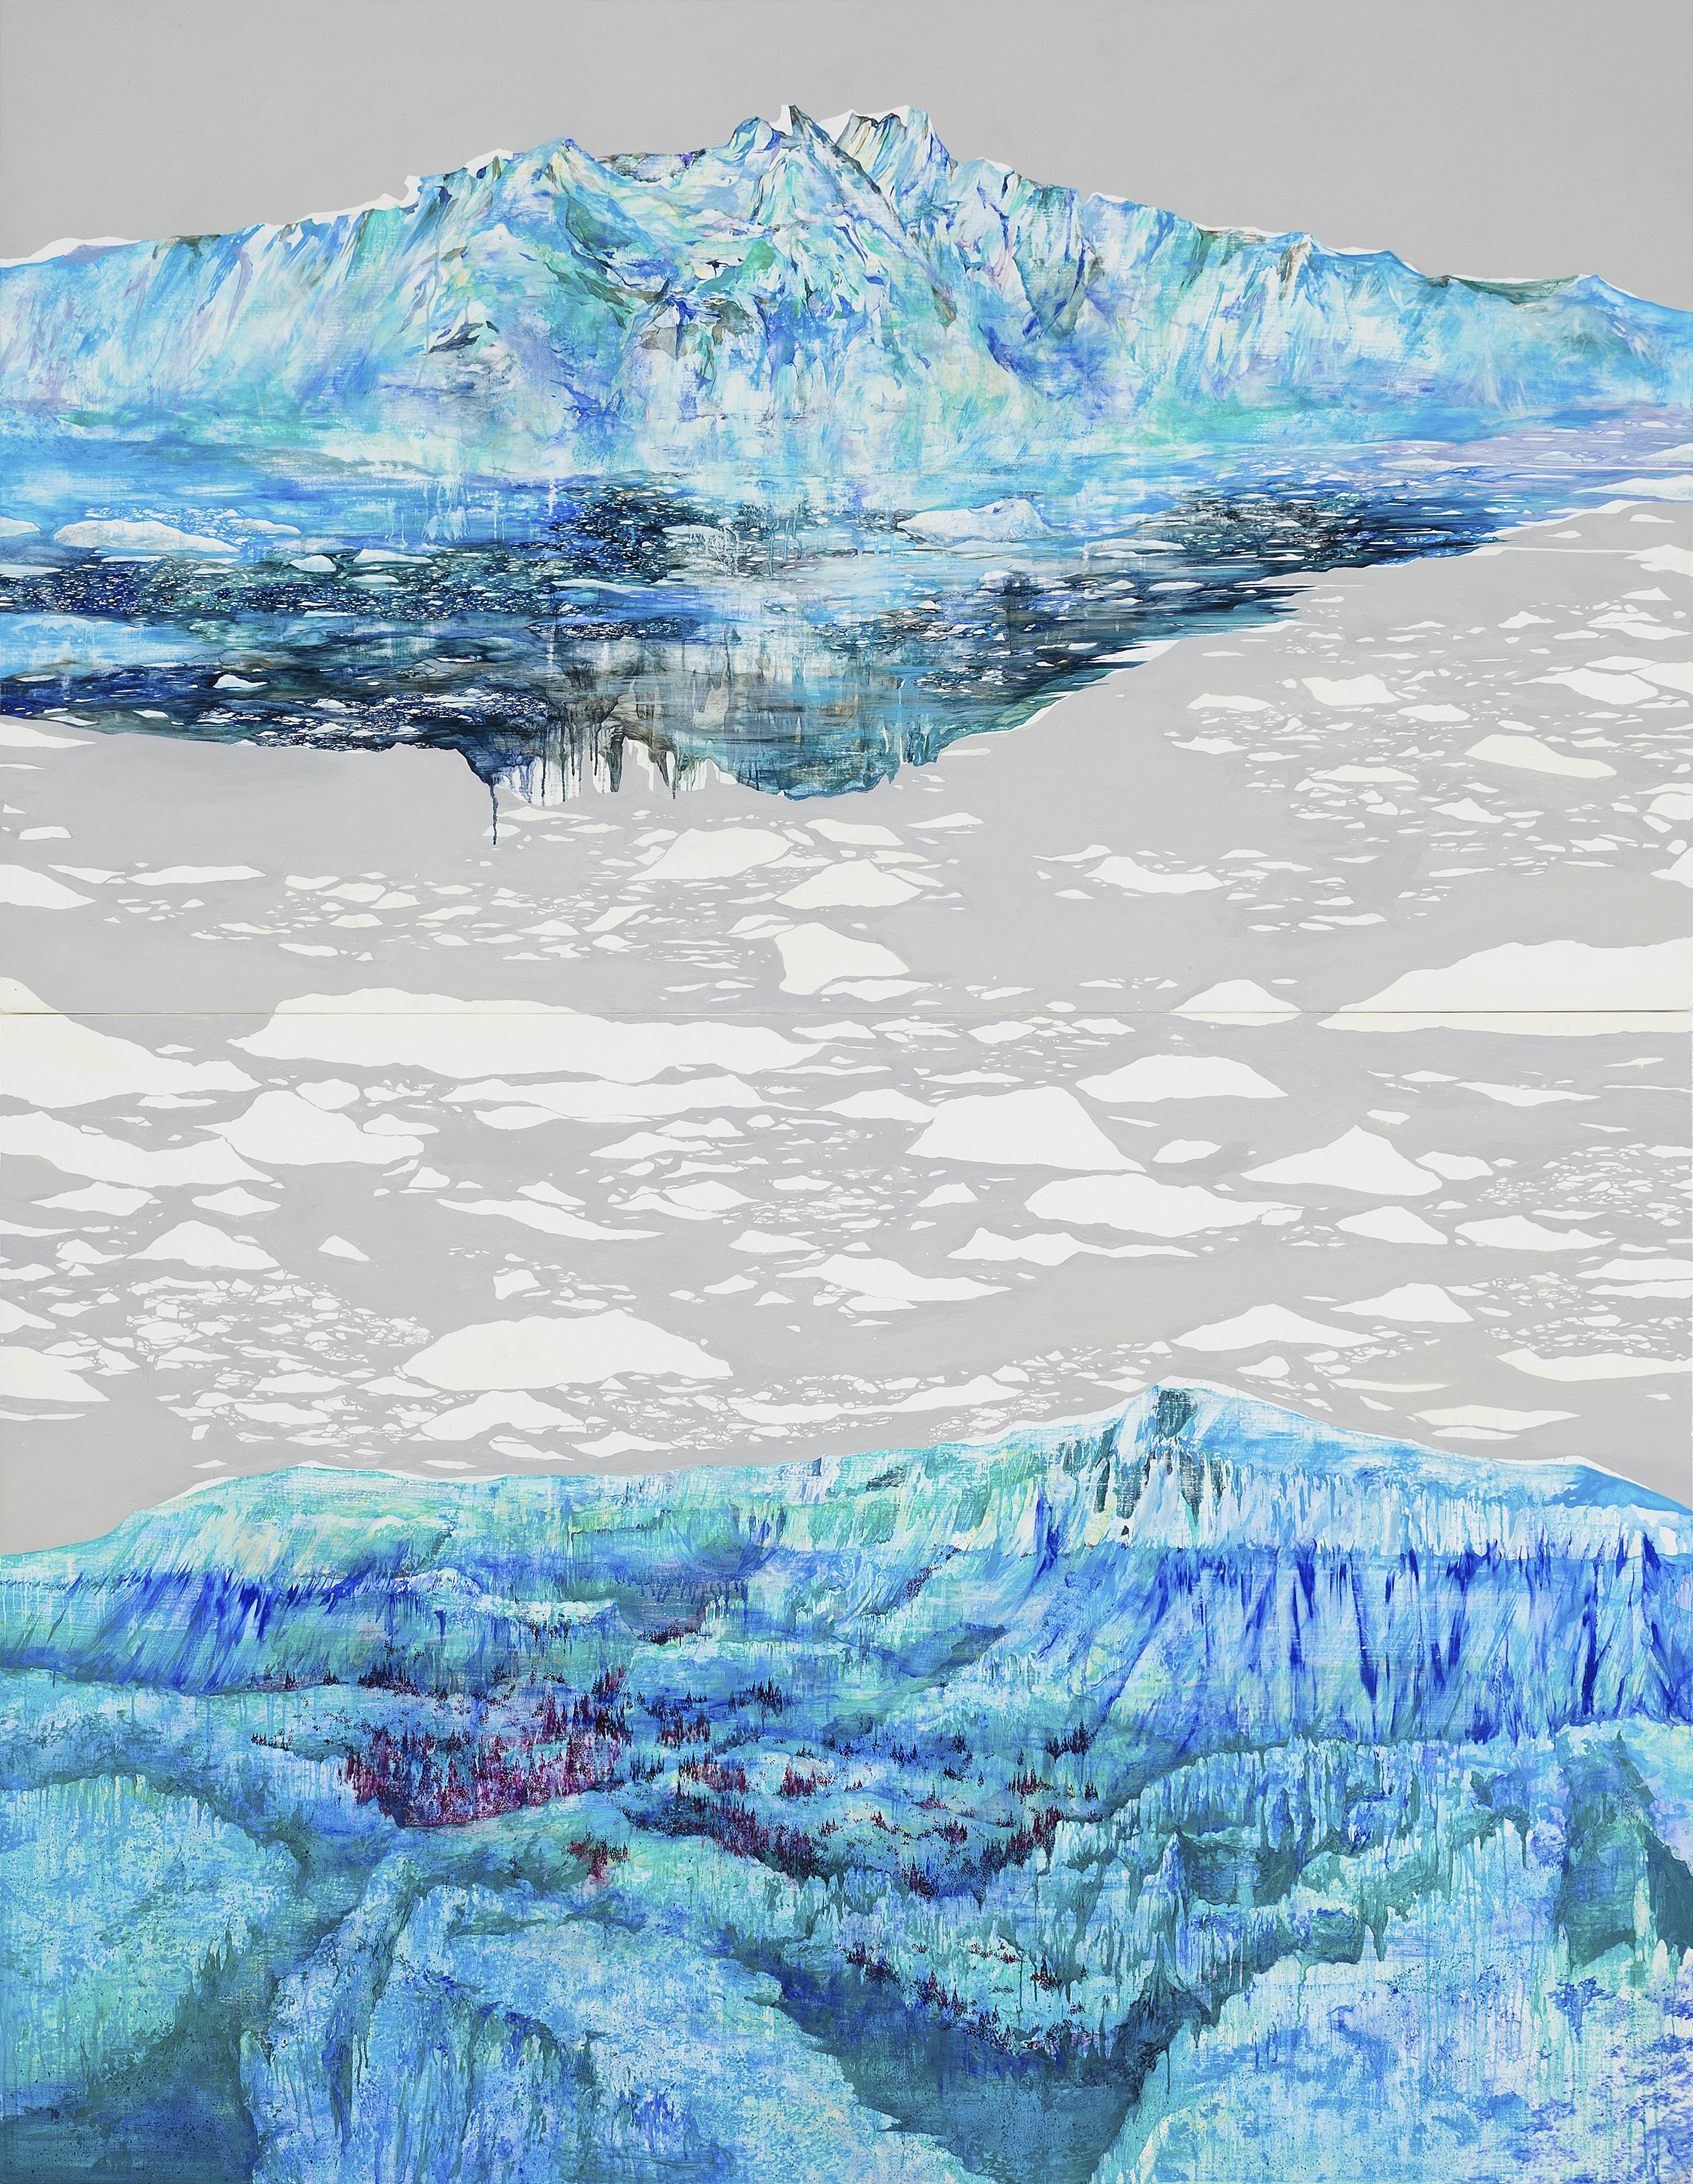 3 The Glacier Canyon